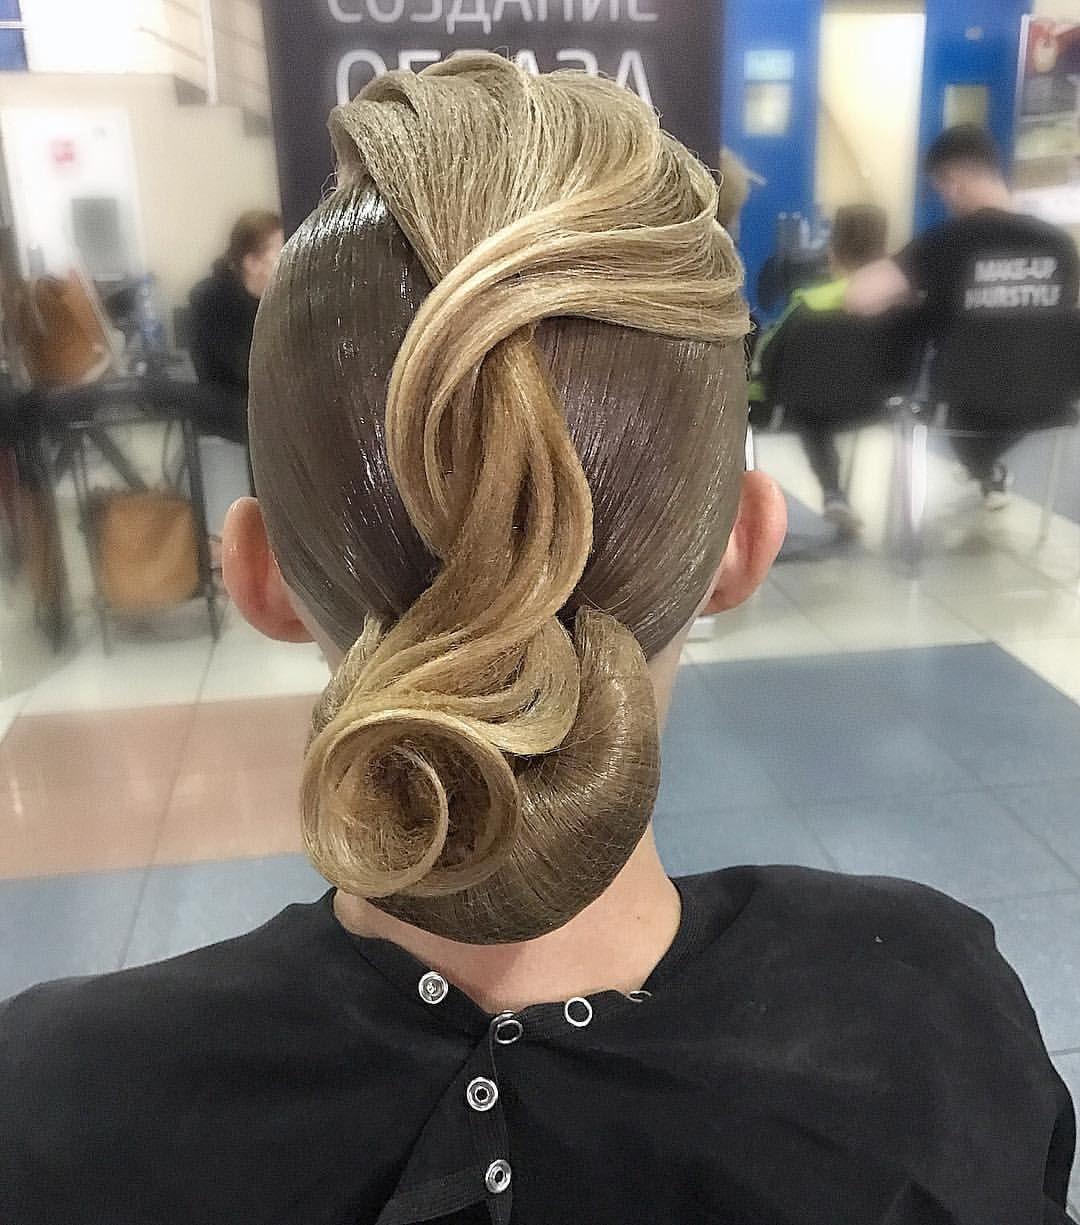 Pricheska Dlya Desyati Tancev Imidzh Studiya Artecreo Competition Hair Dance Hairstyles Hair Rhinestone